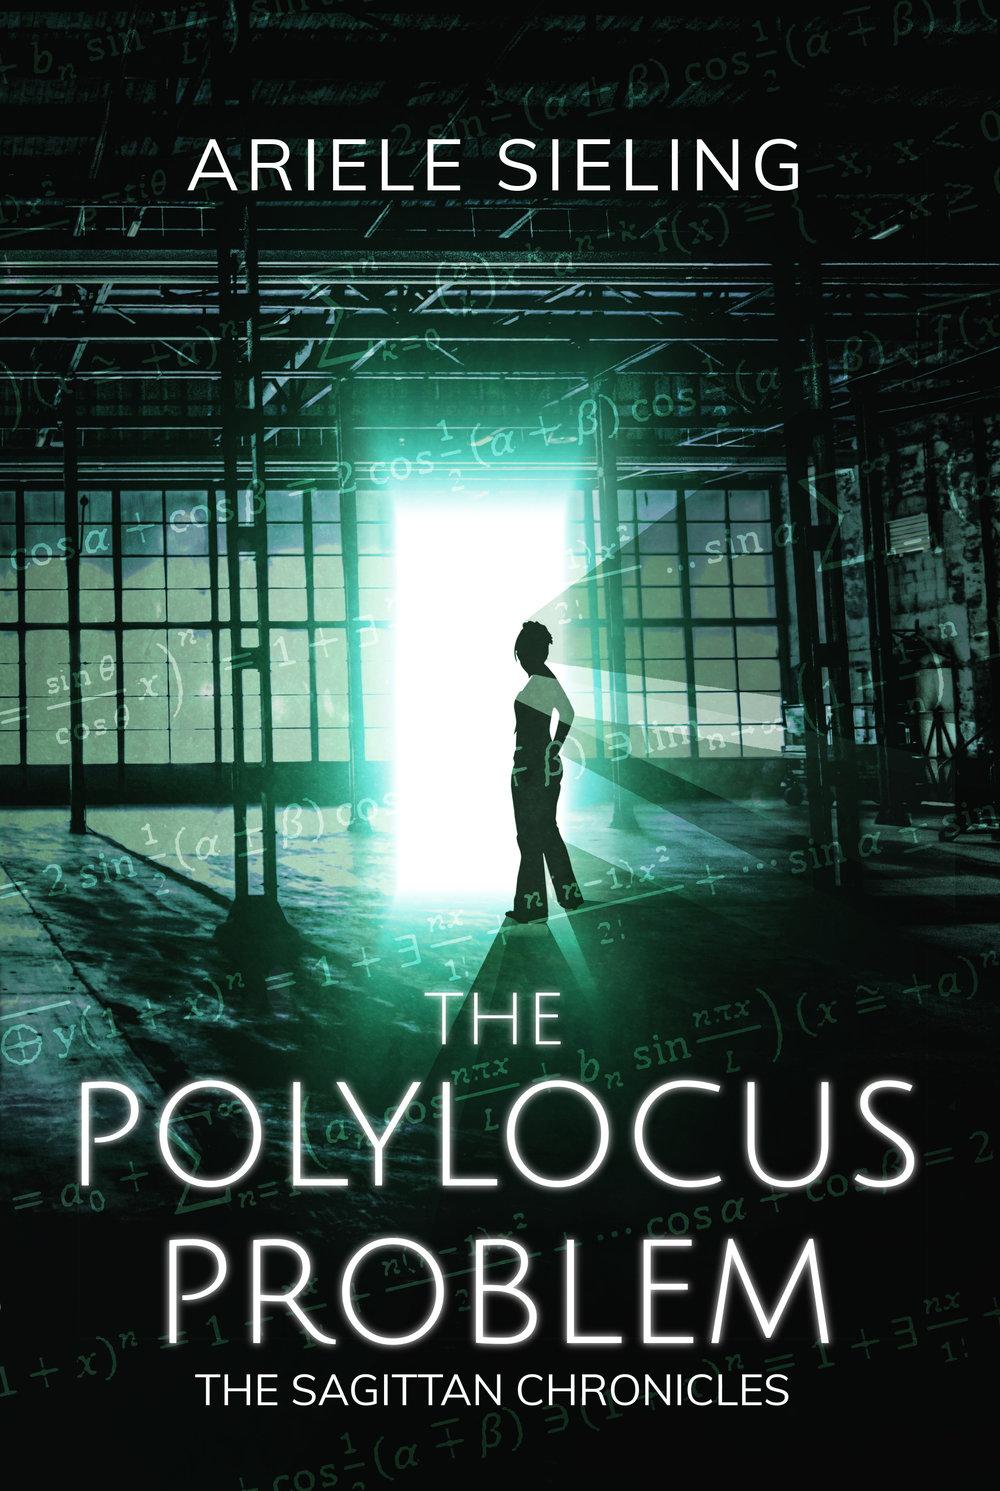 polylocusproblem